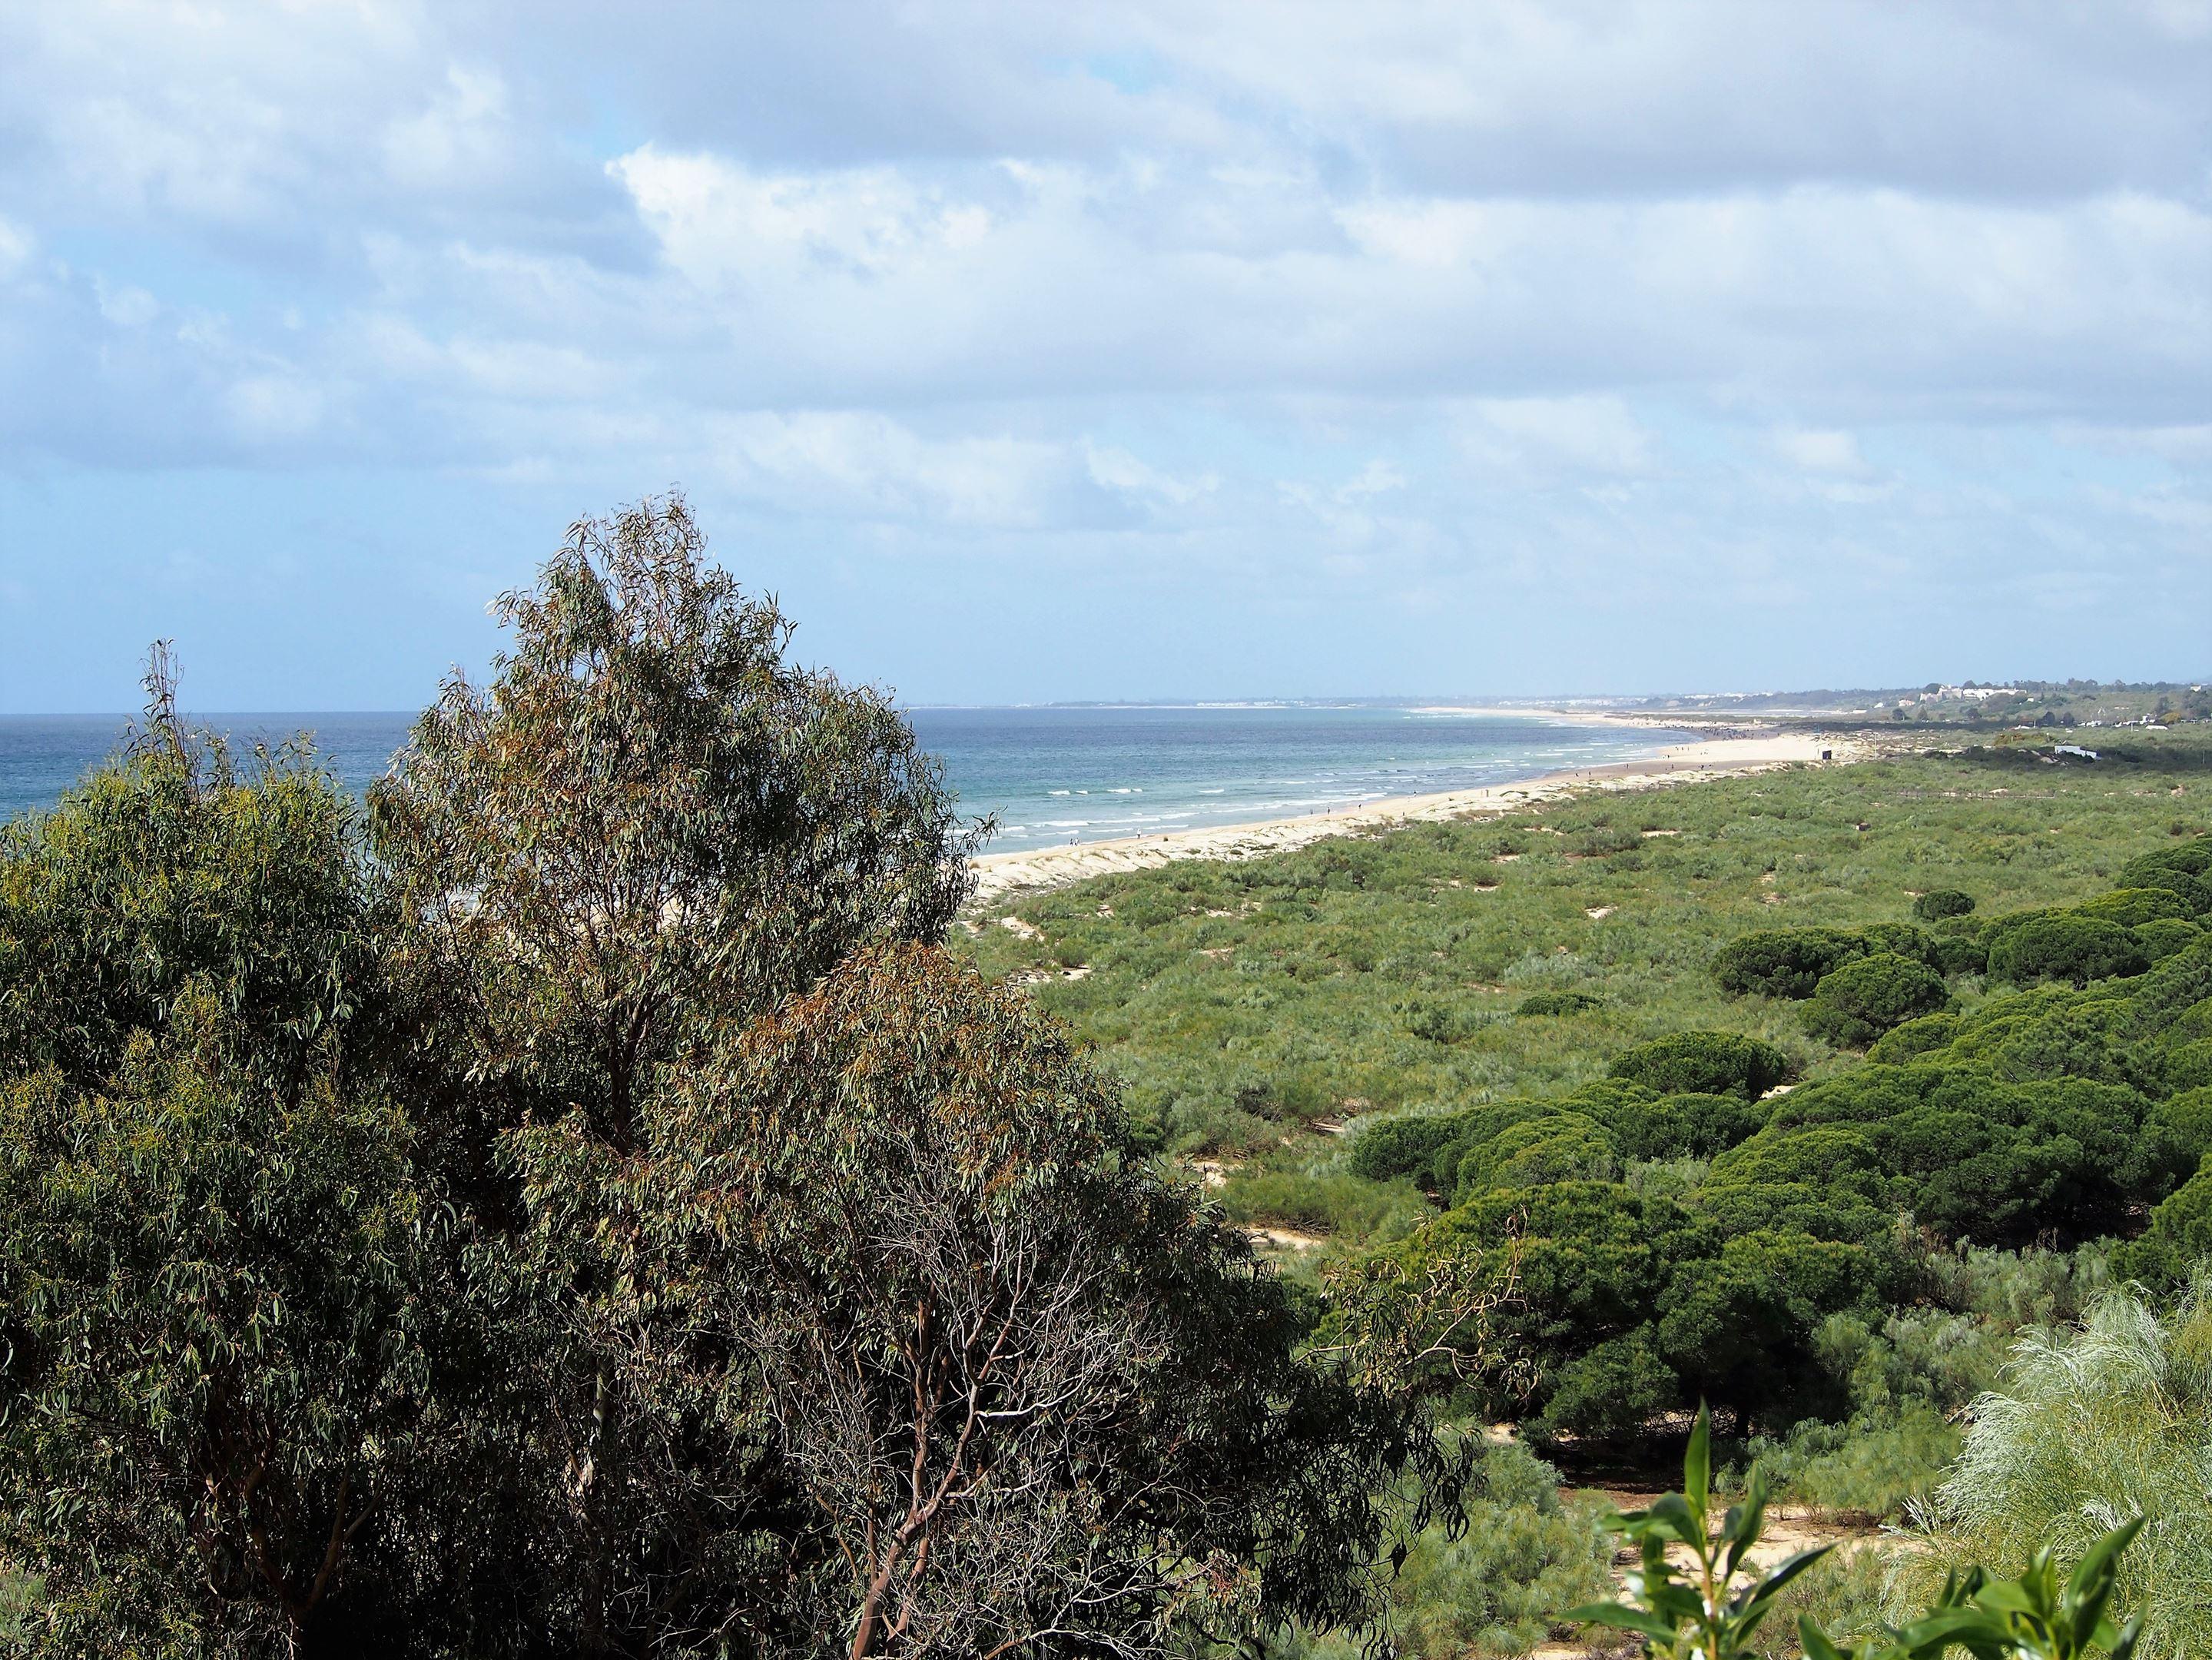 Praia Verde, mirando hacia el oeste hacia Praia da Alagoa